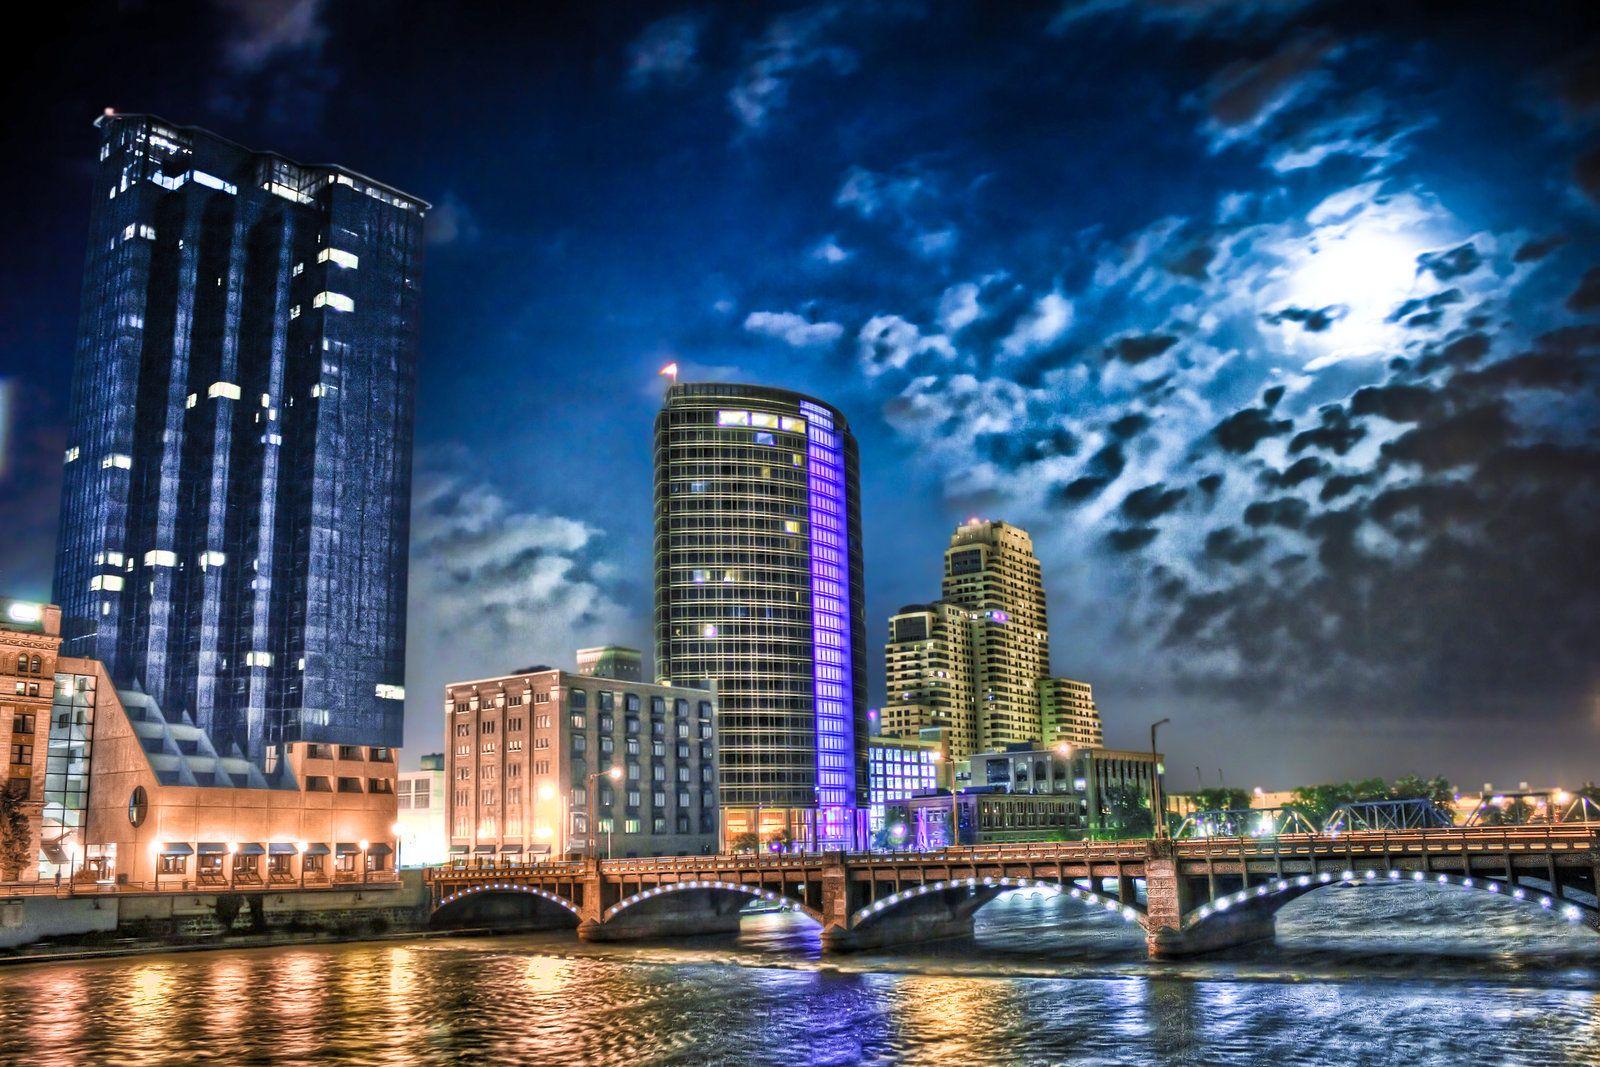 Grand Rapids, MI lit up at night | pure michigan ...